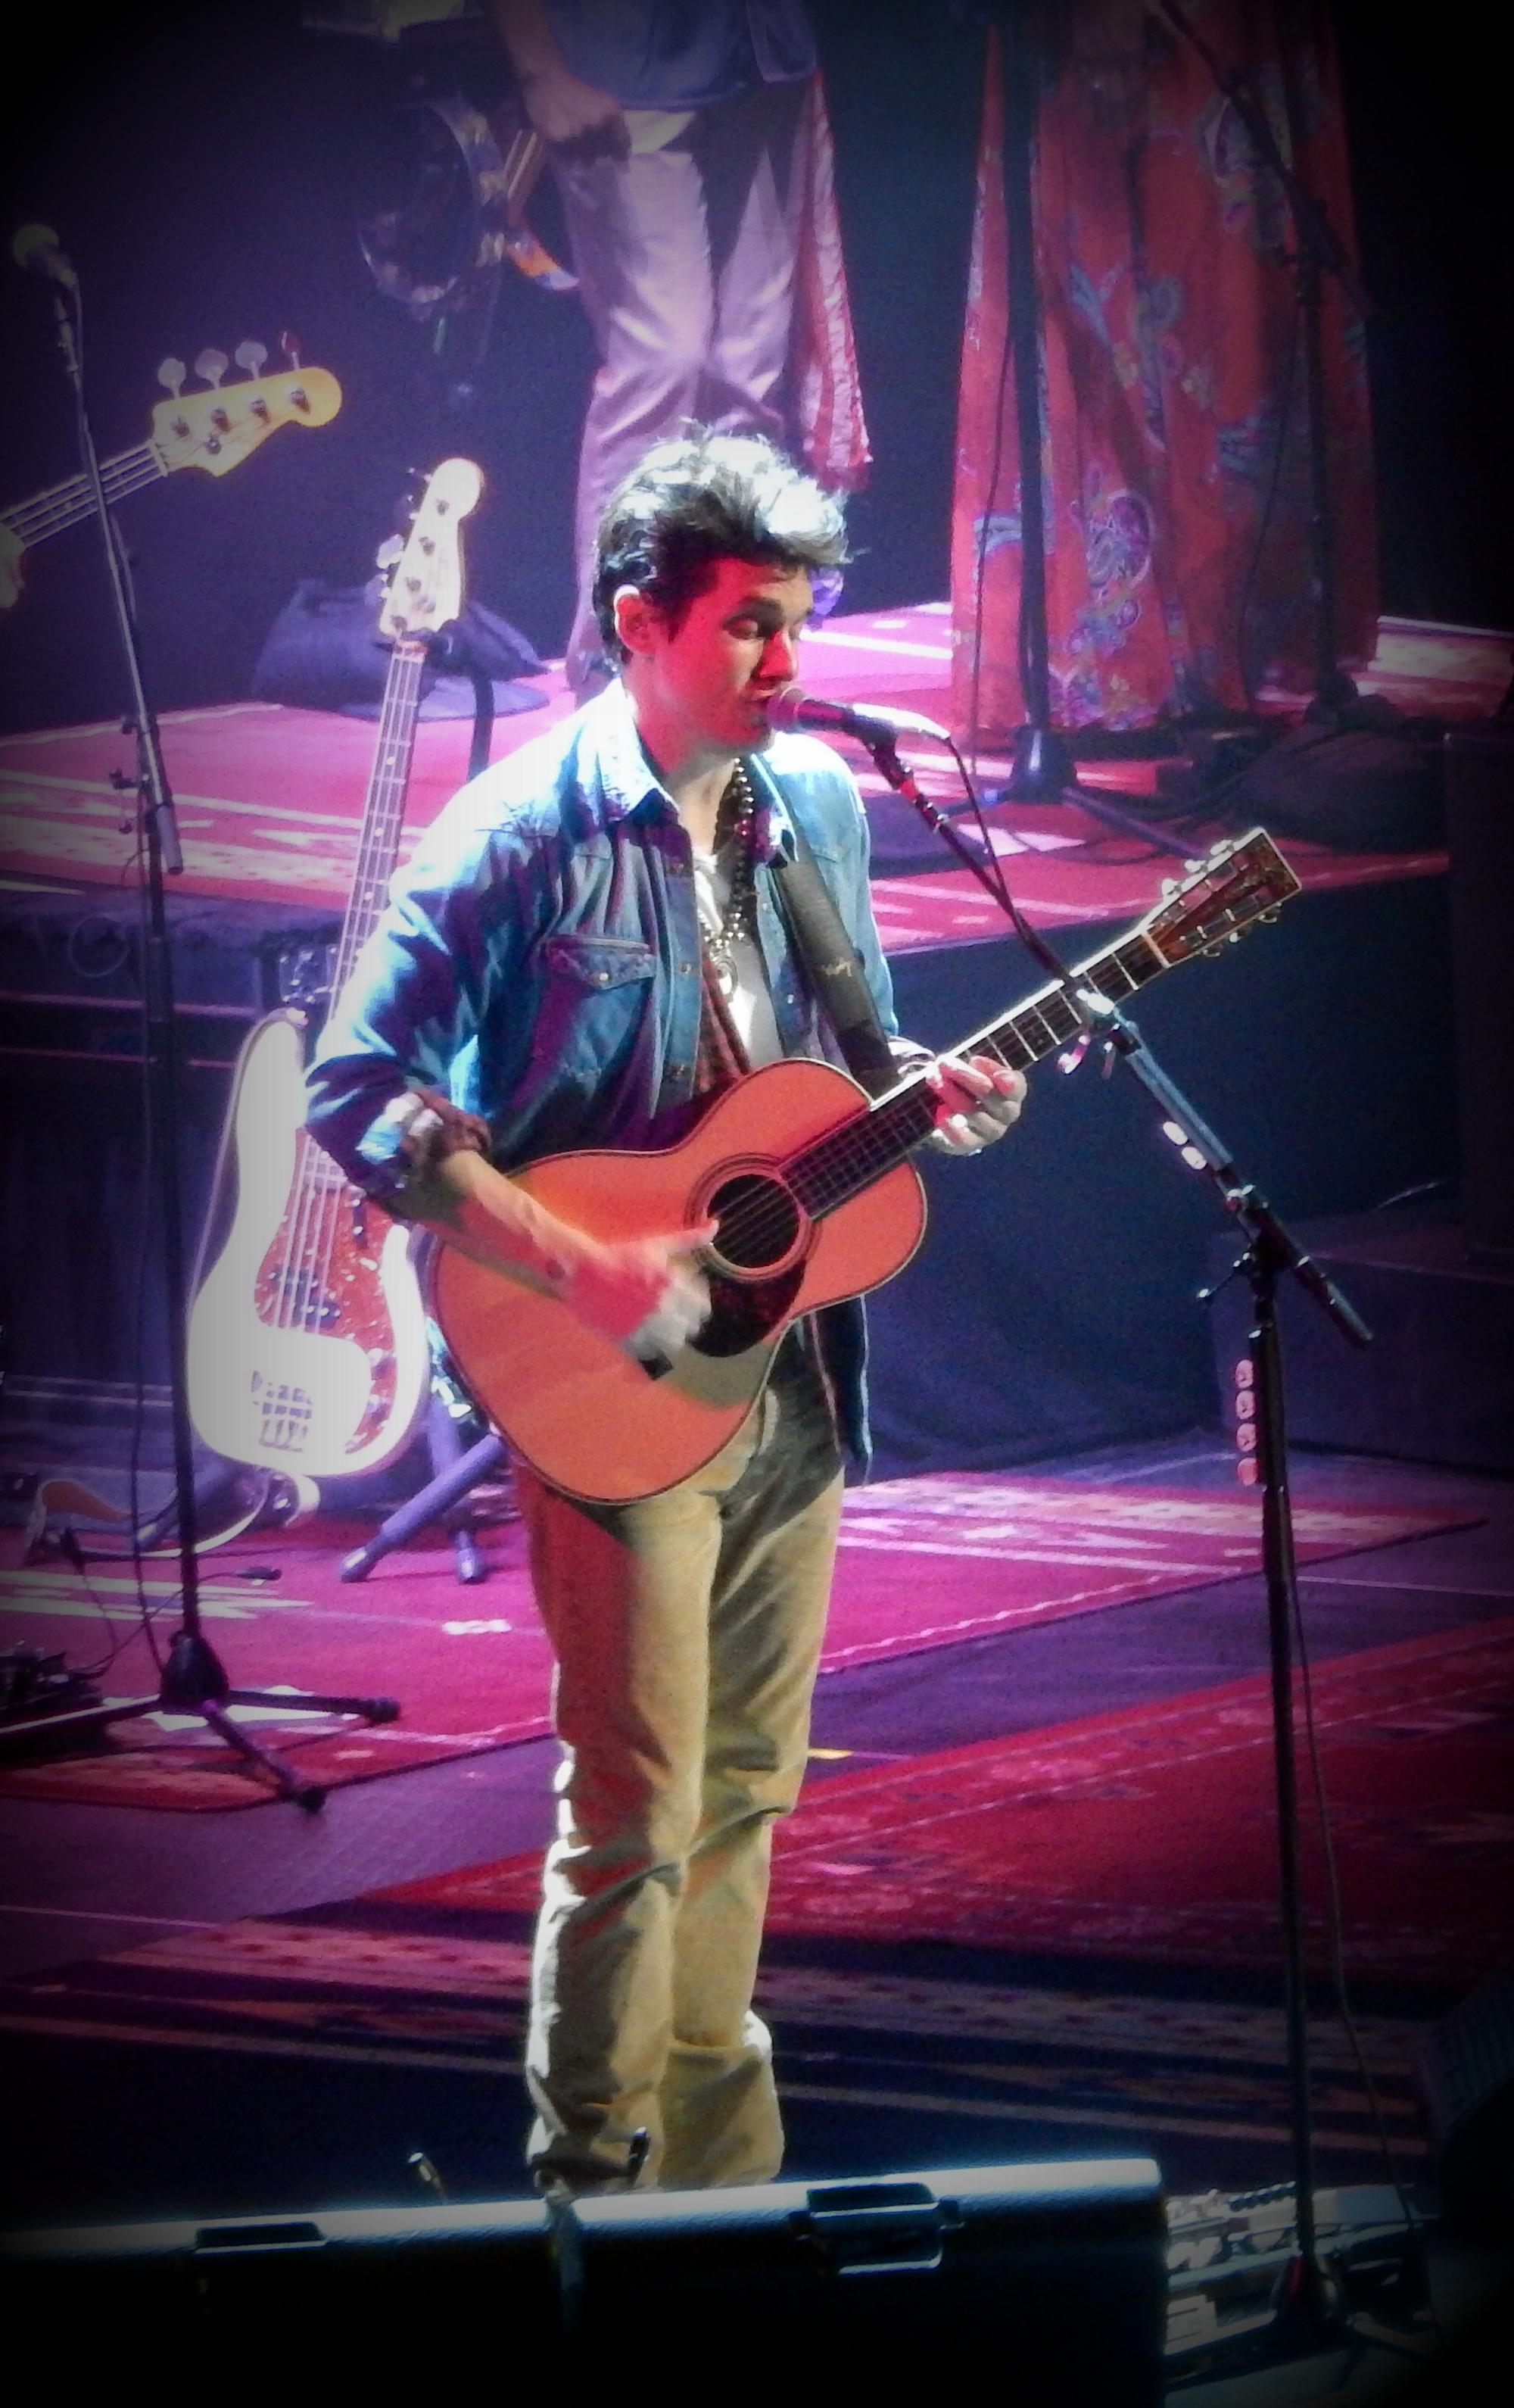 John Mayer Guitar Chords Guitar Tabs And Lyrics Album From Chordie